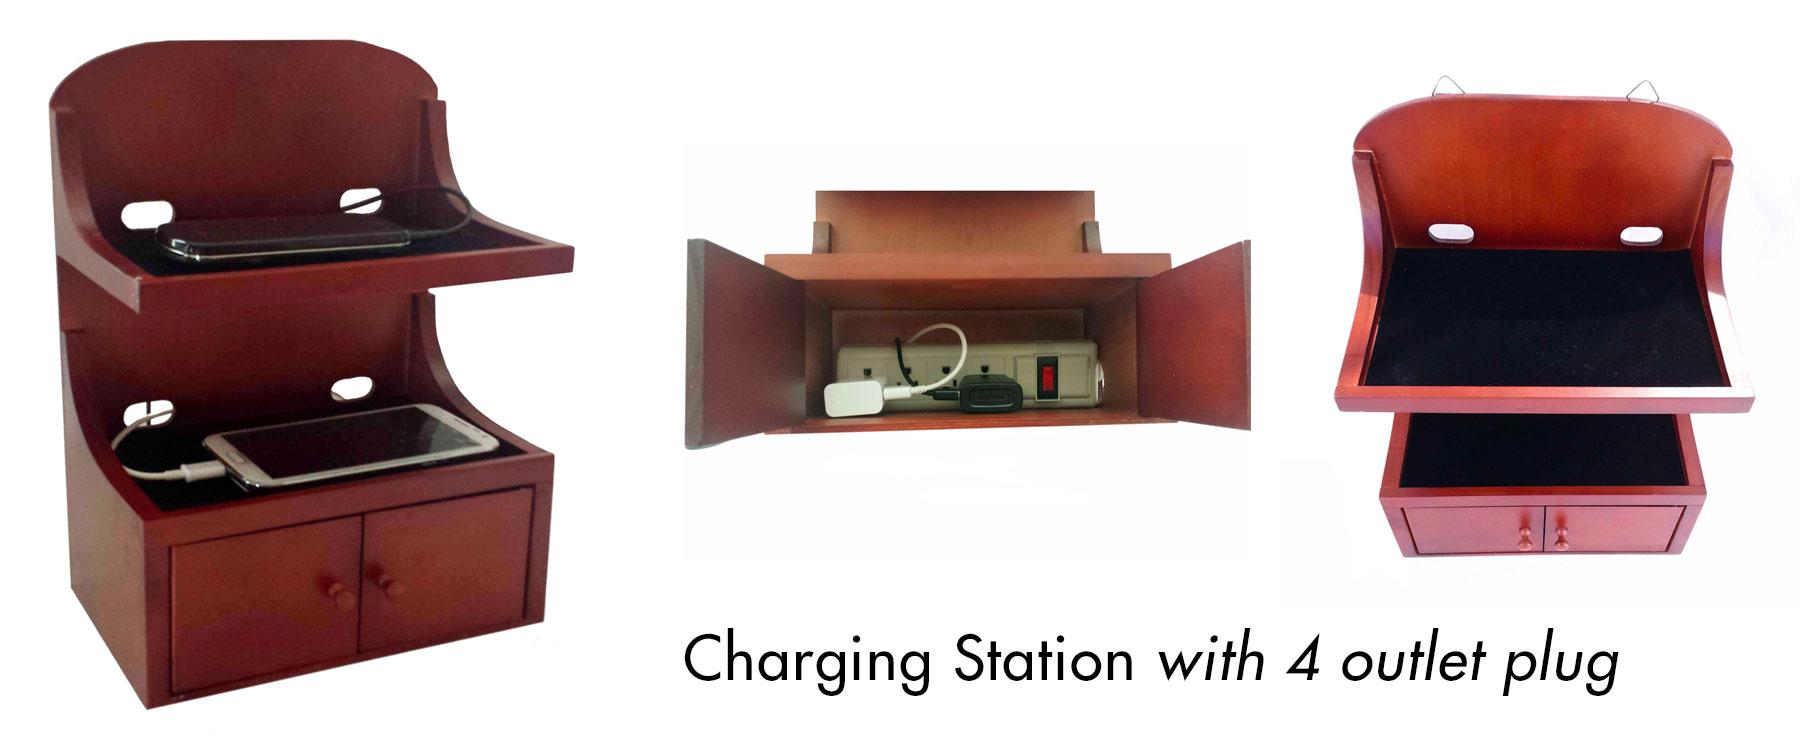 Charging-Station-Home-slideshow-2.jpg